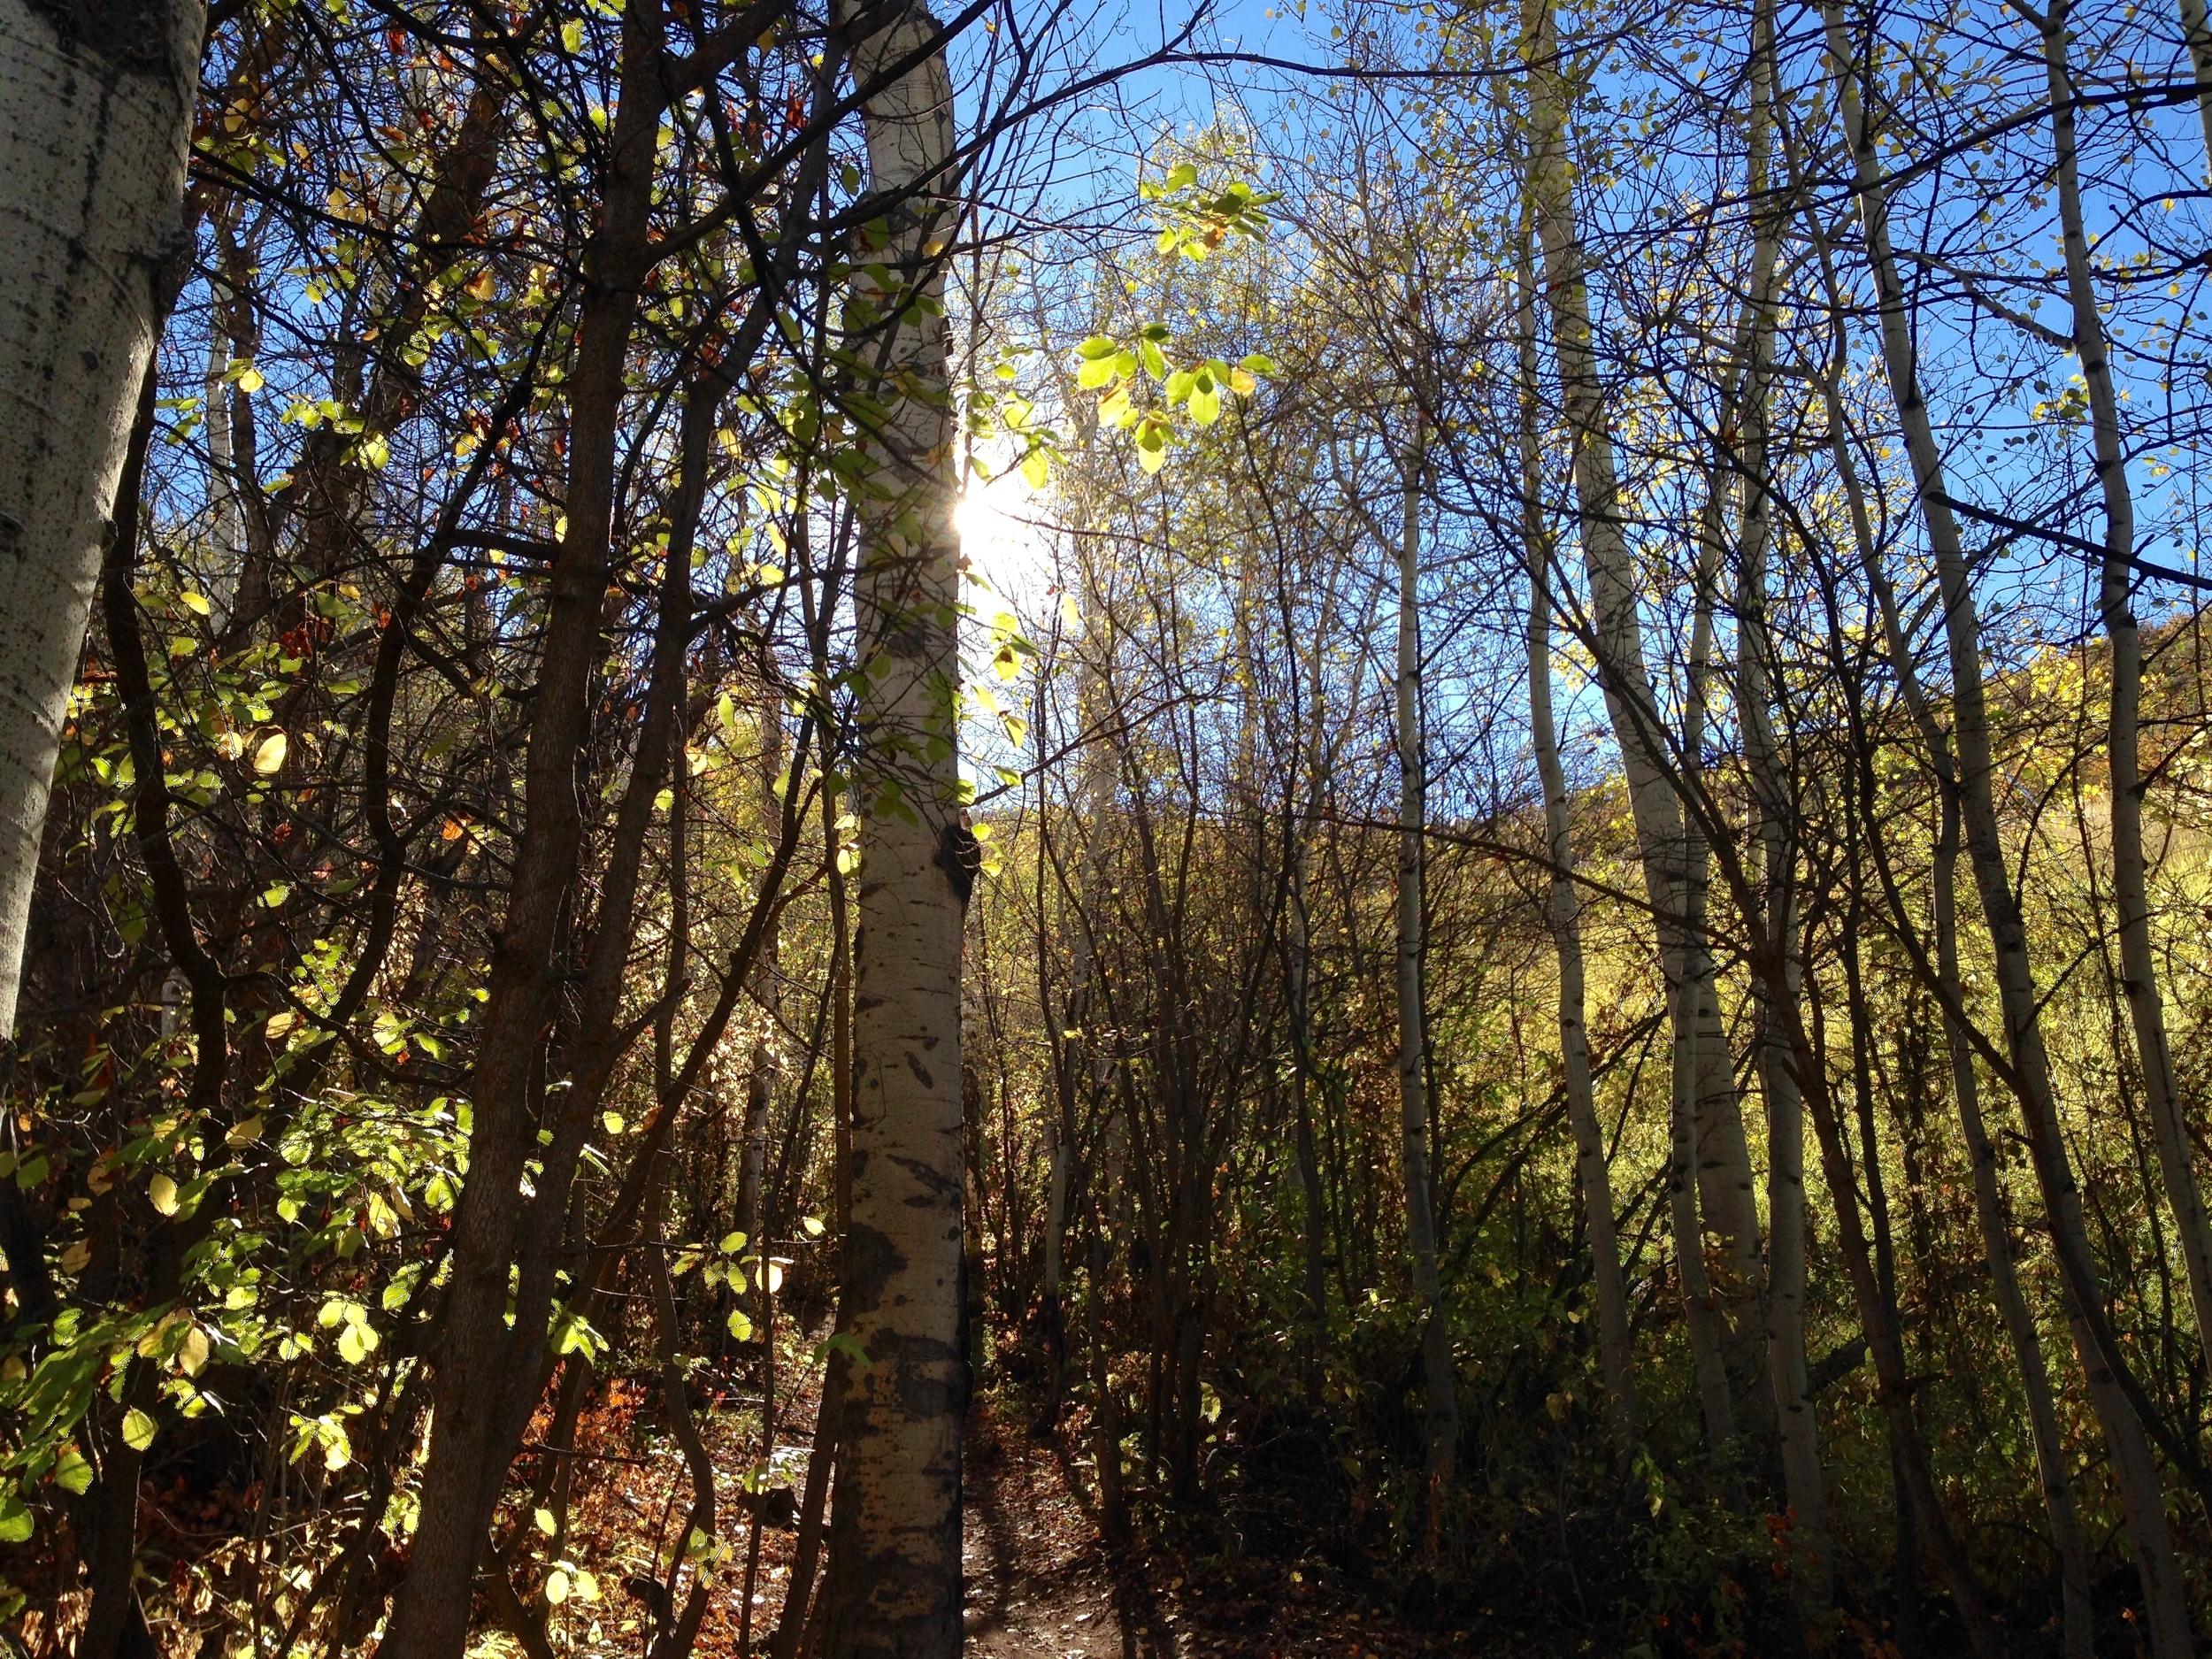 Light peeking through the trees.